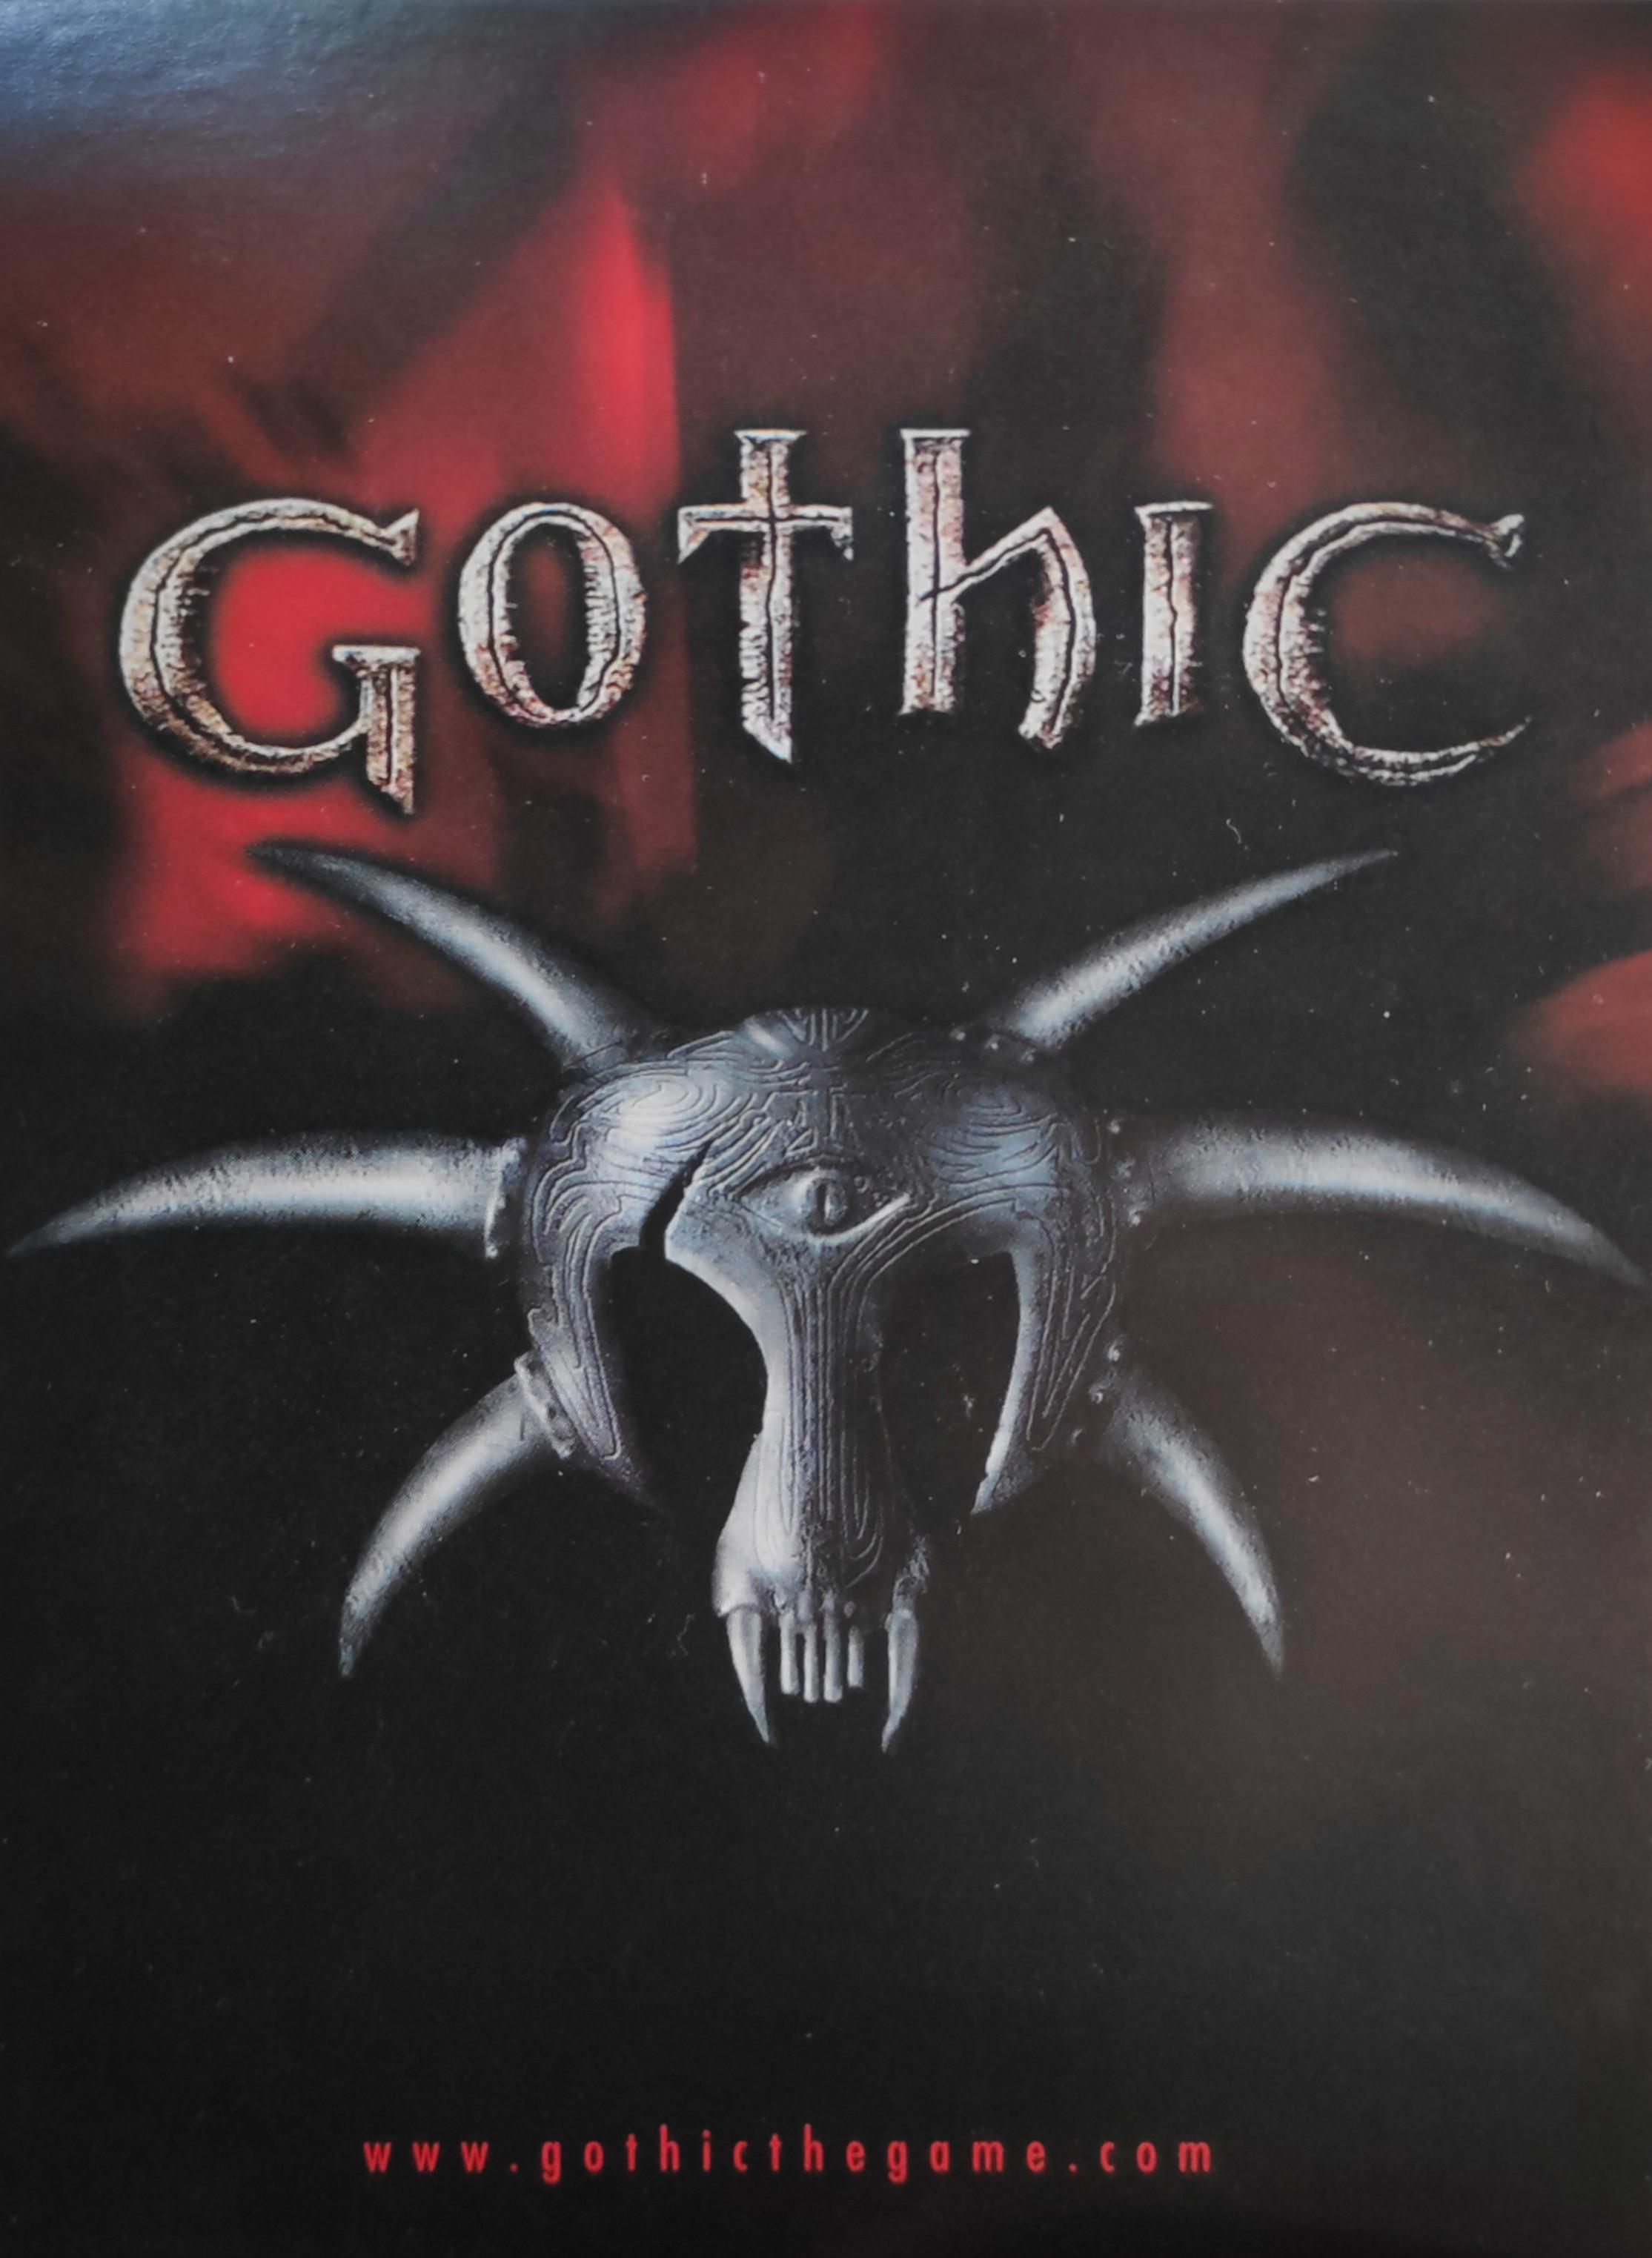 Edgar Karte Photo: 'Become a Gothic Girl' Vorderseite